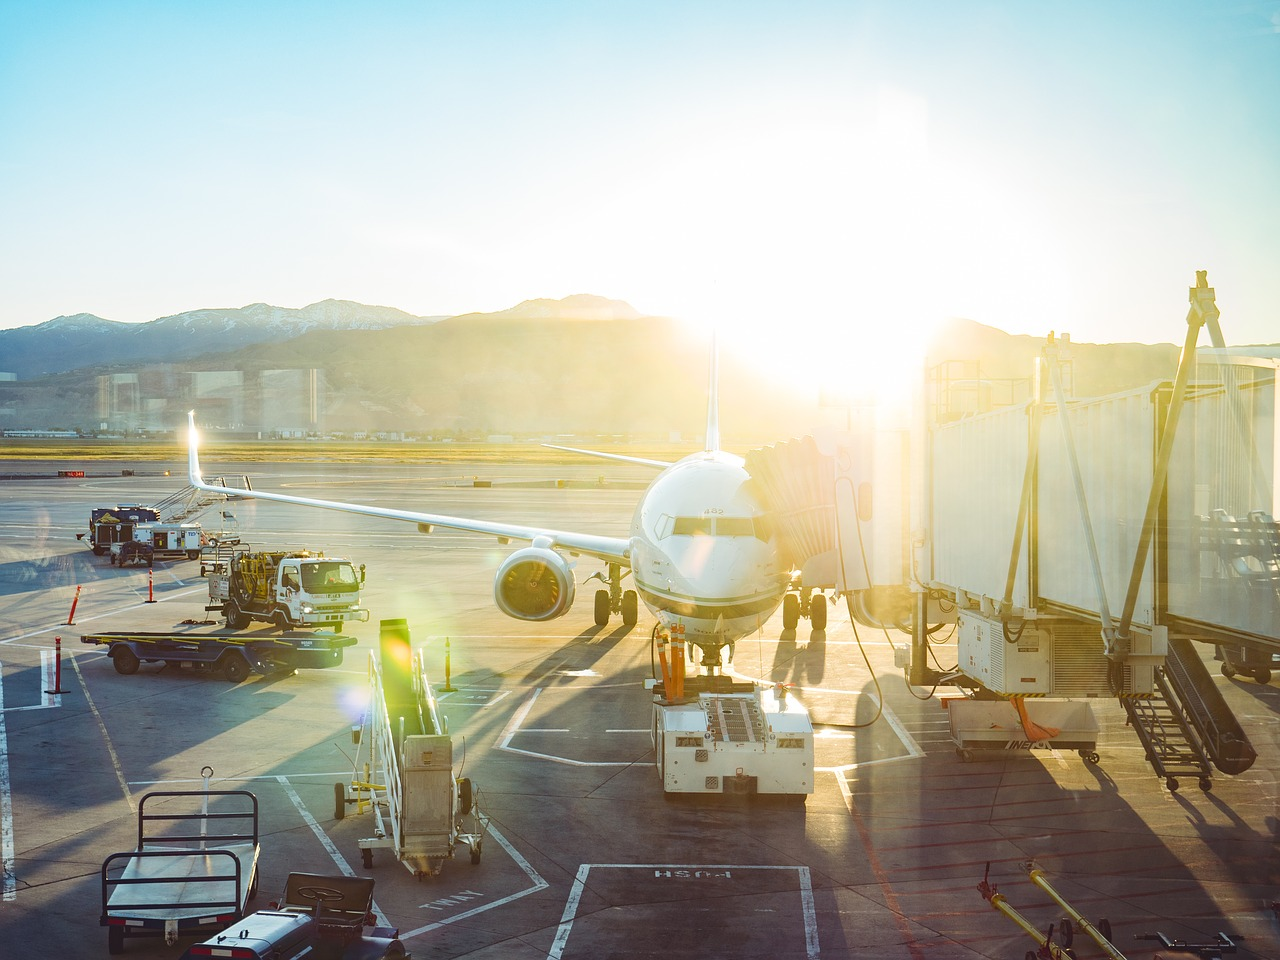 Airports and Aerodromes